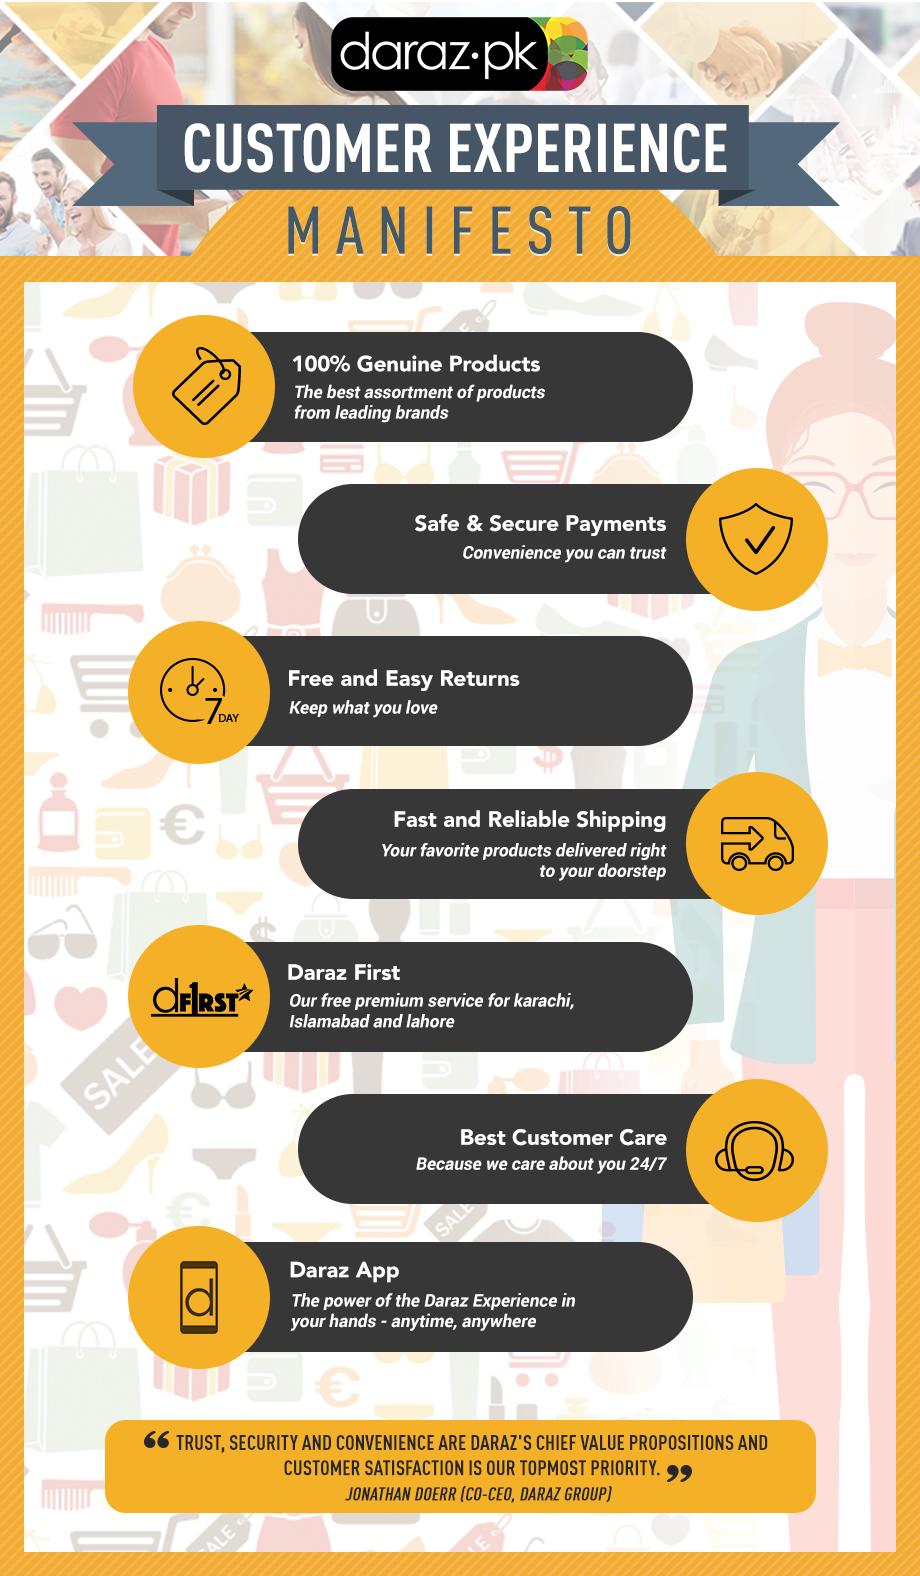 Daraz.pk Reveals its Customer Experience Manifesto